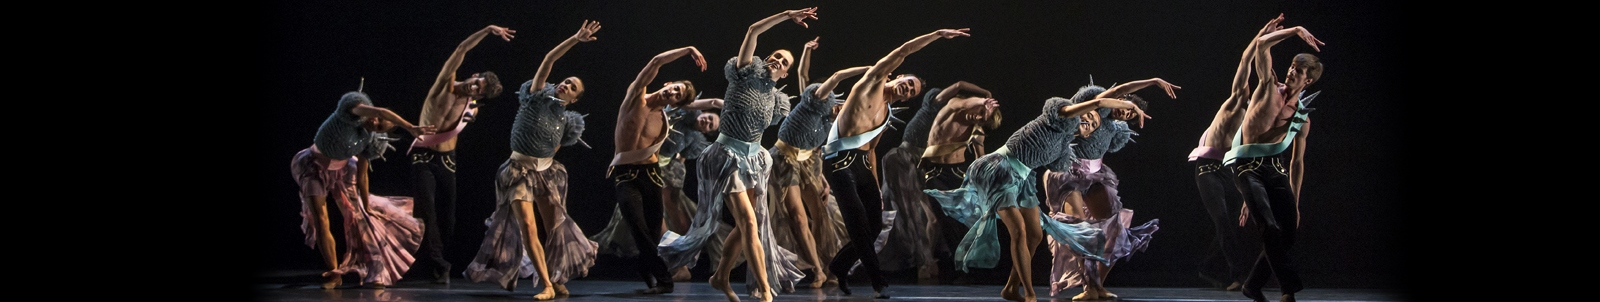 el Cascanueces ballet Tchaikovsky Ginebra vídeo